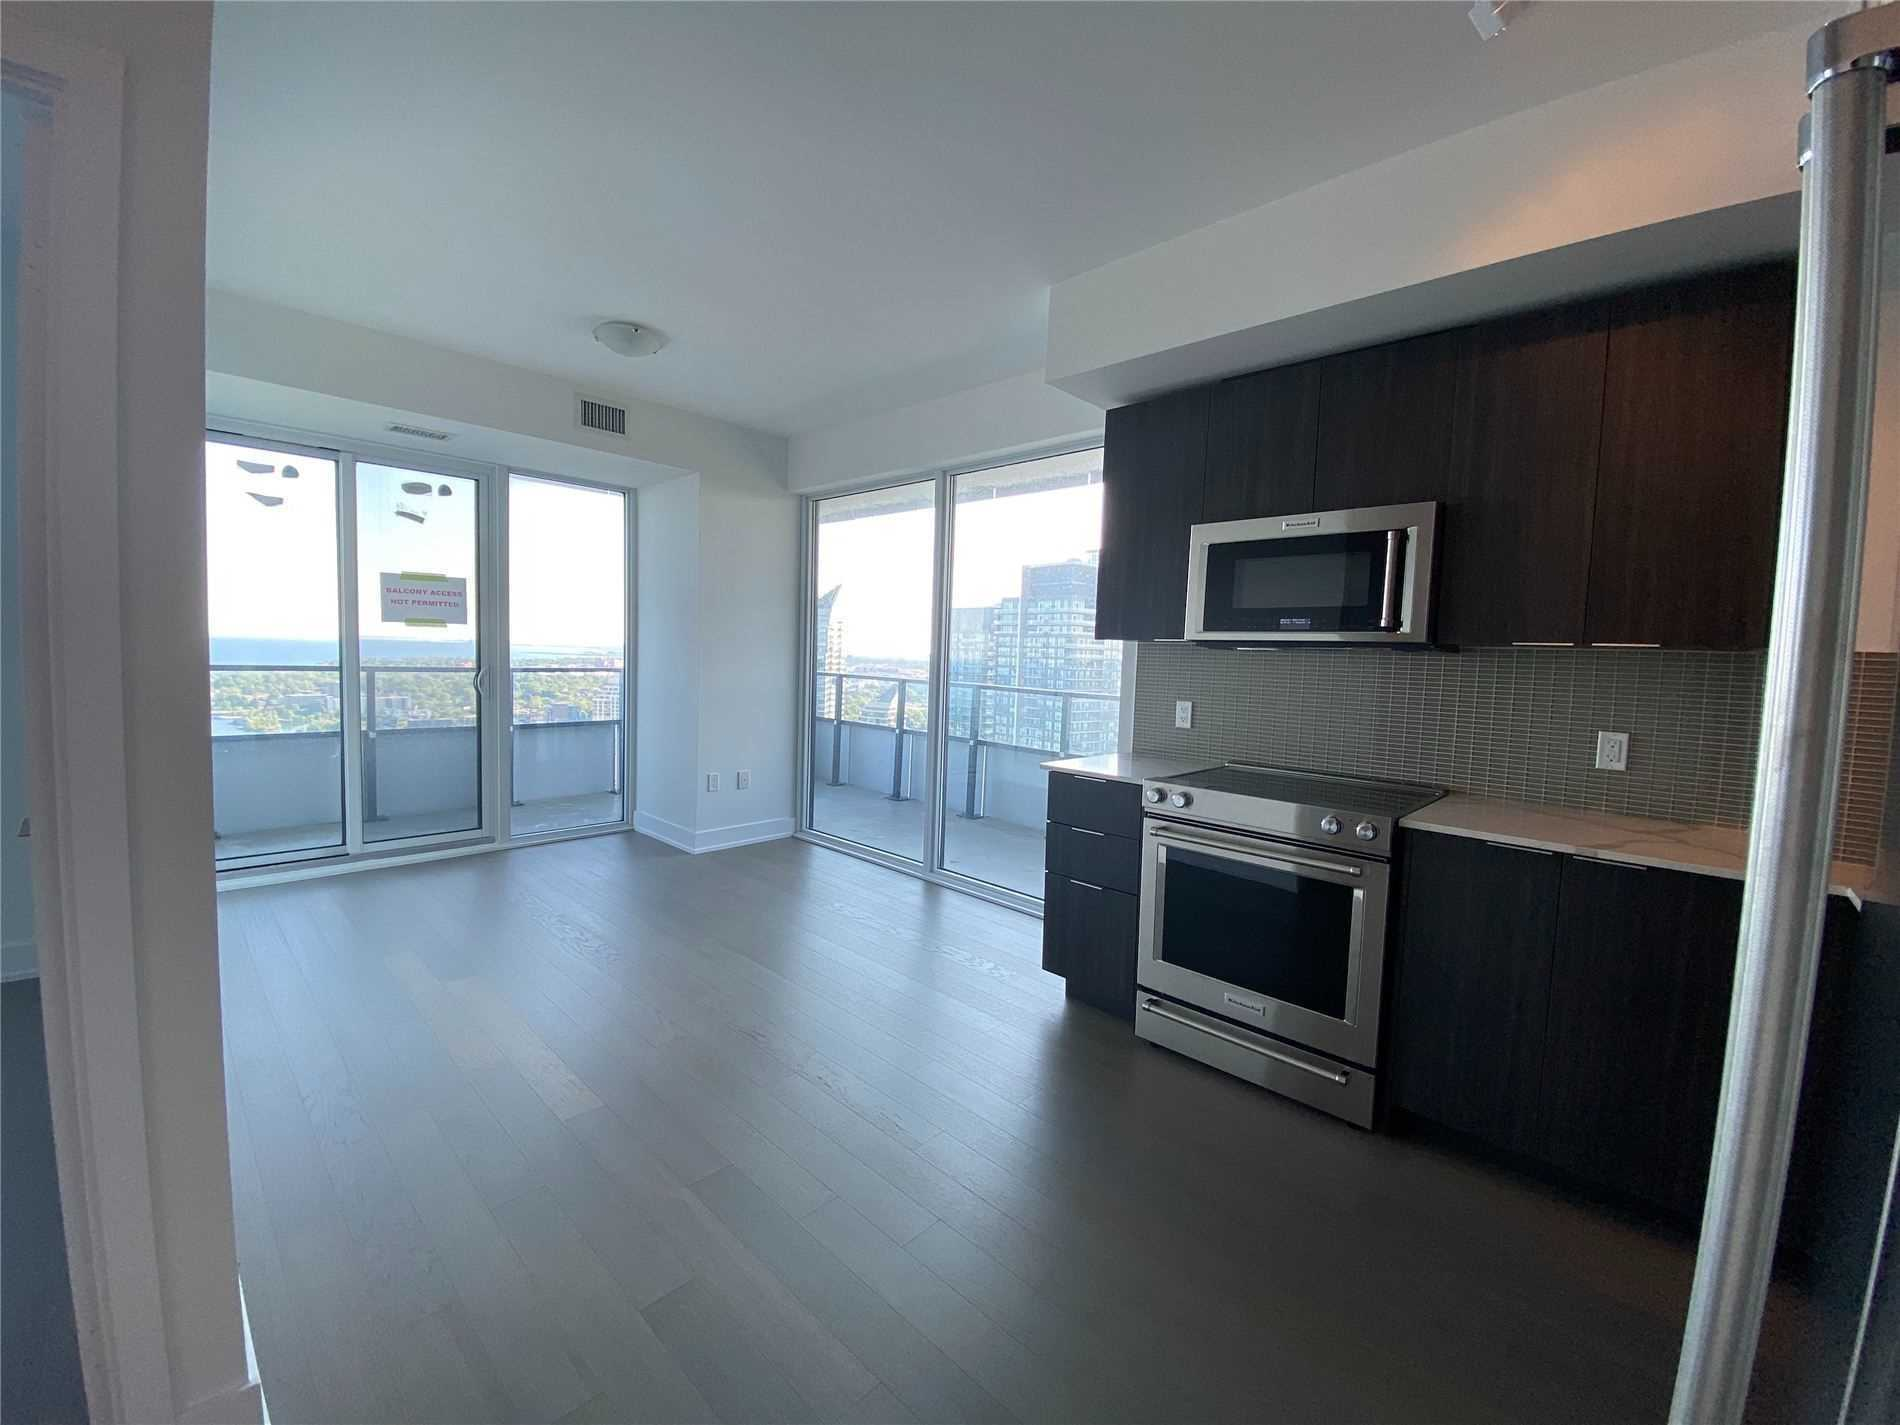 Condo Apt For Lease In Toronto , 2 Bedrooms Bedrooms, ,1 BathroomBathrooms,Condo Apt,For Lease,3702,Shore Breeze